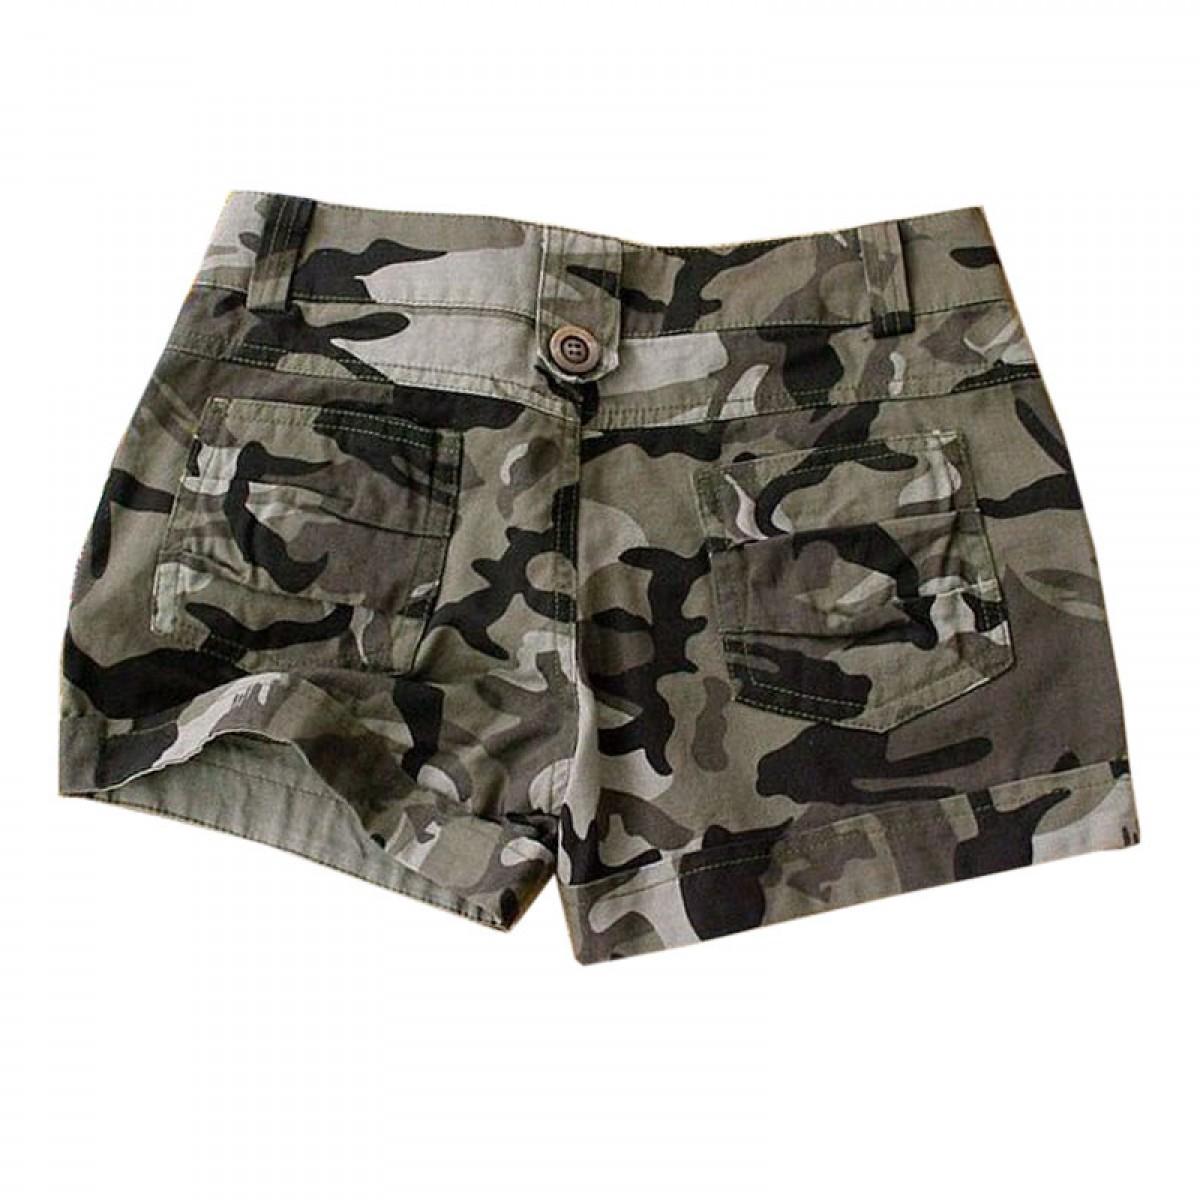 Womens Cargo Shorts | LATICCI